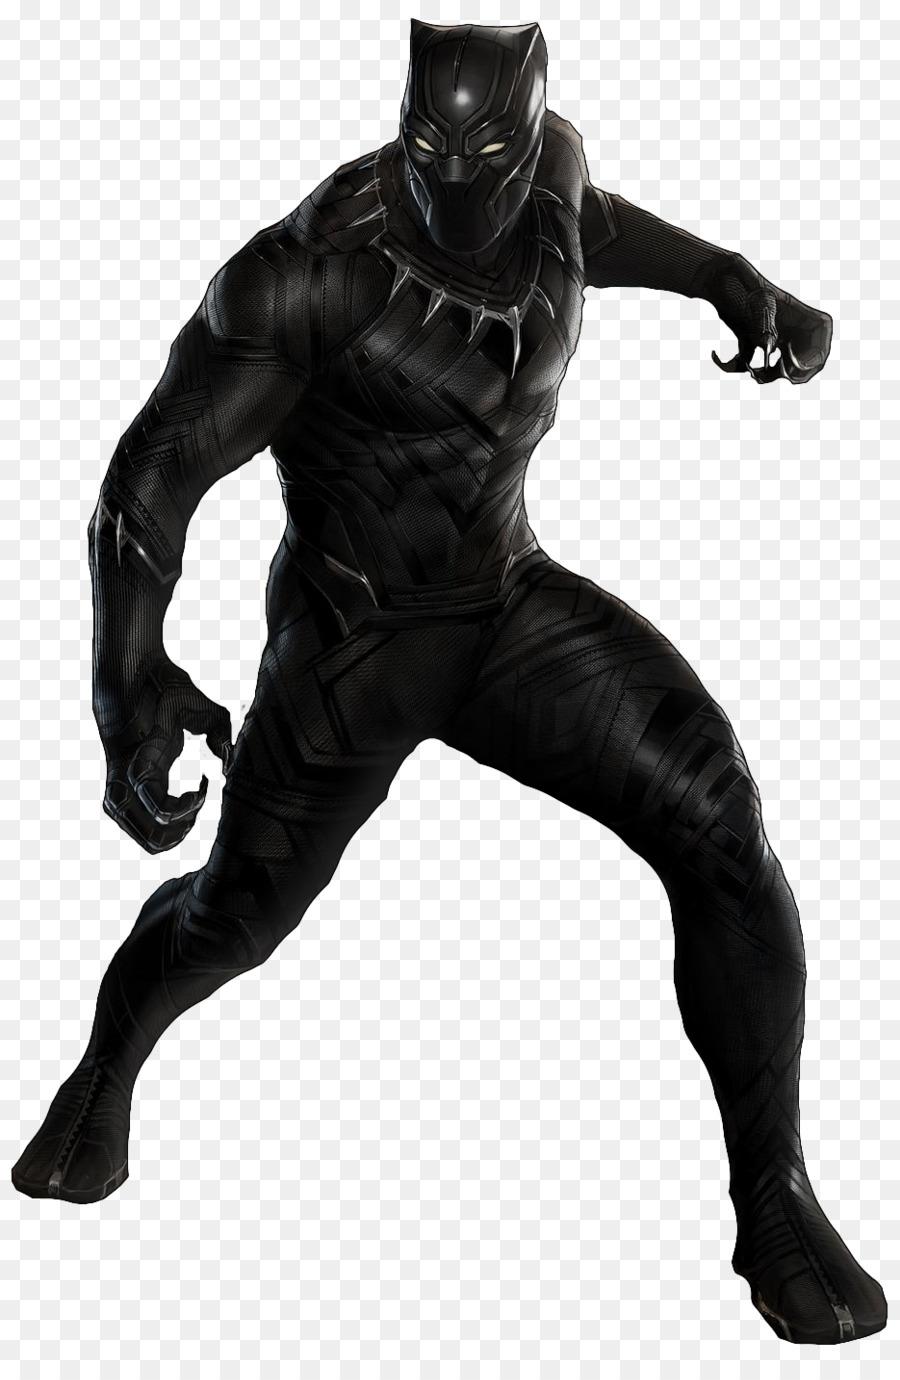 black panther captain america marvel cinematic universe clip art rh kisspng com black panther clip art images black panther clipart images free